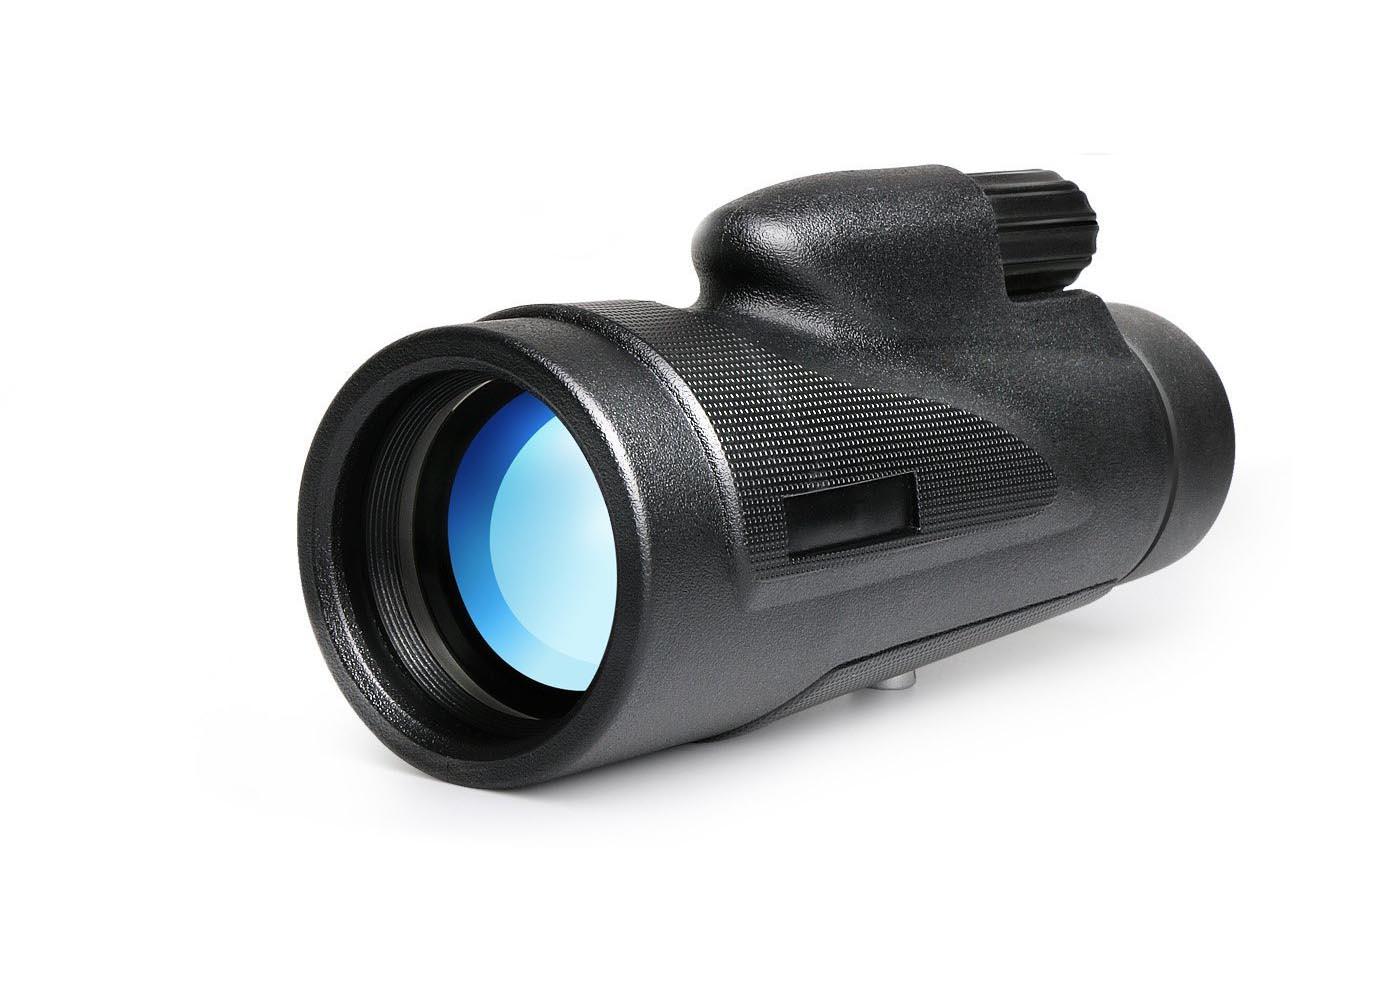 New high powered waterproof monocular telescope zoom